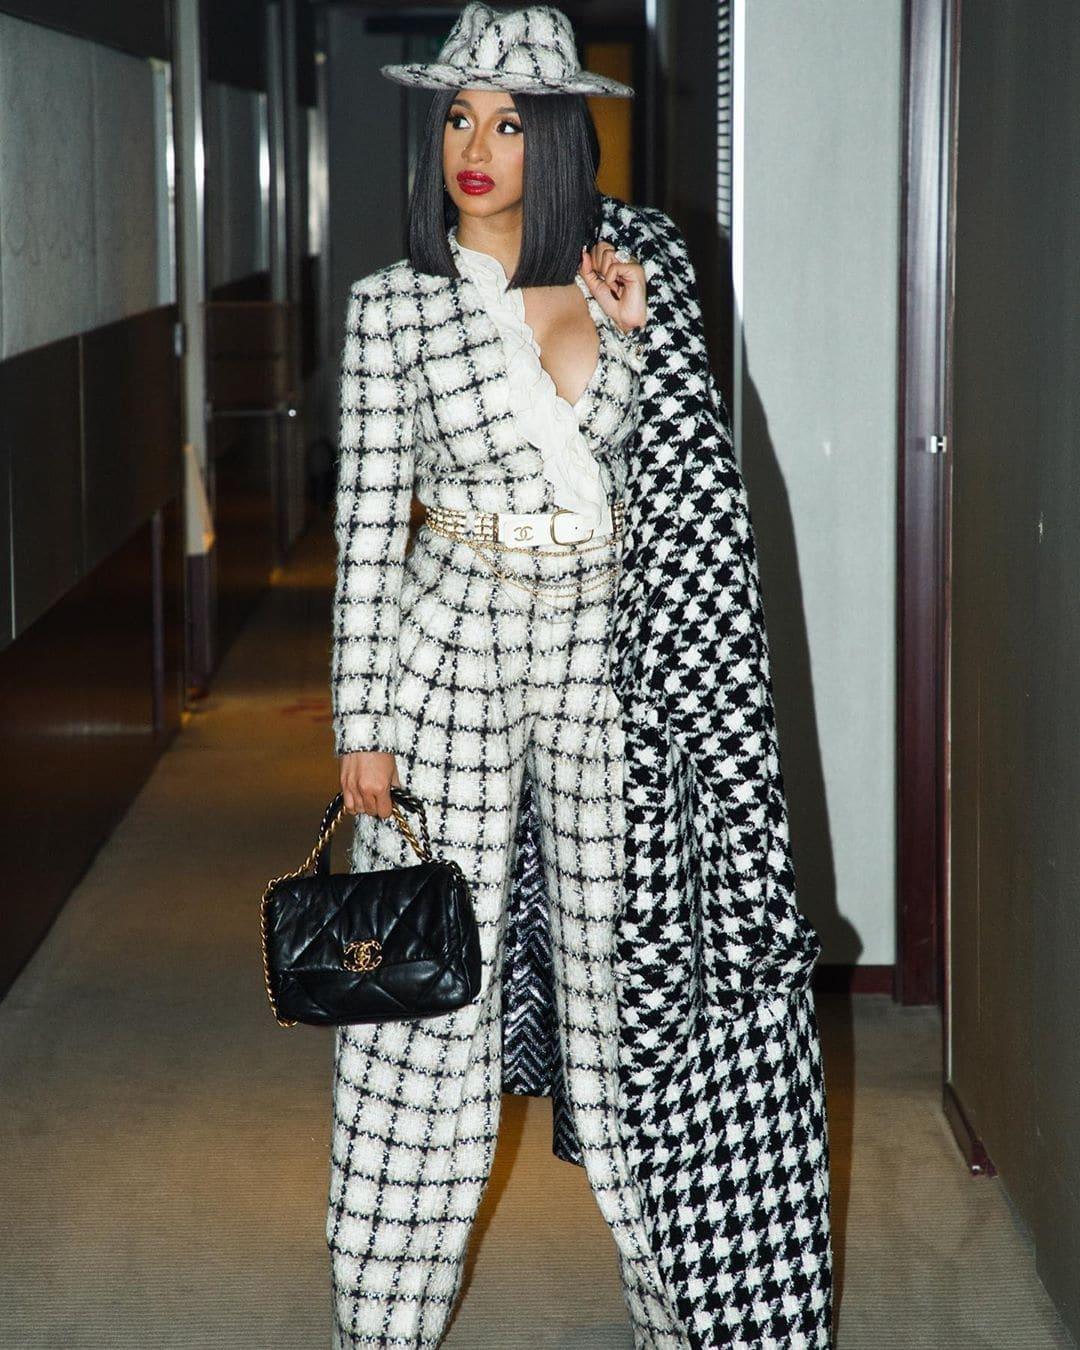 Cardi B in Chanel